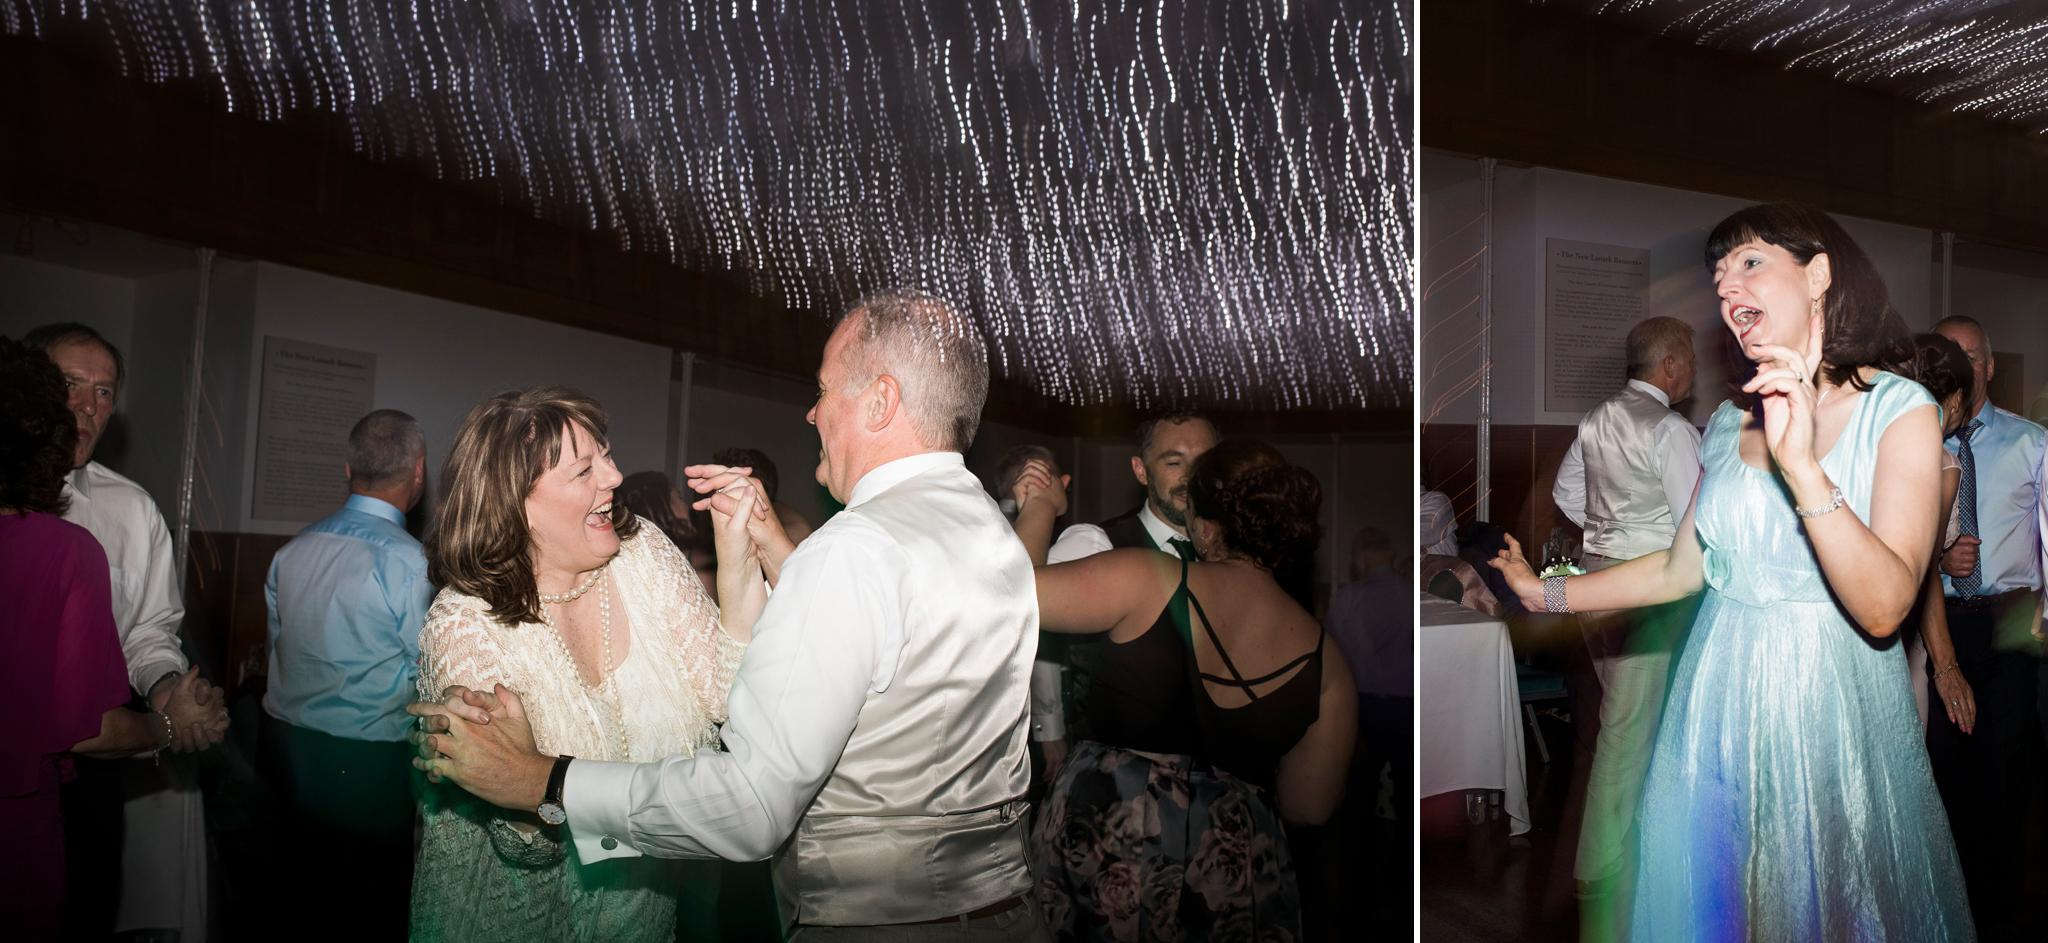 124-destination-wedding-photographer-scotland.jpg